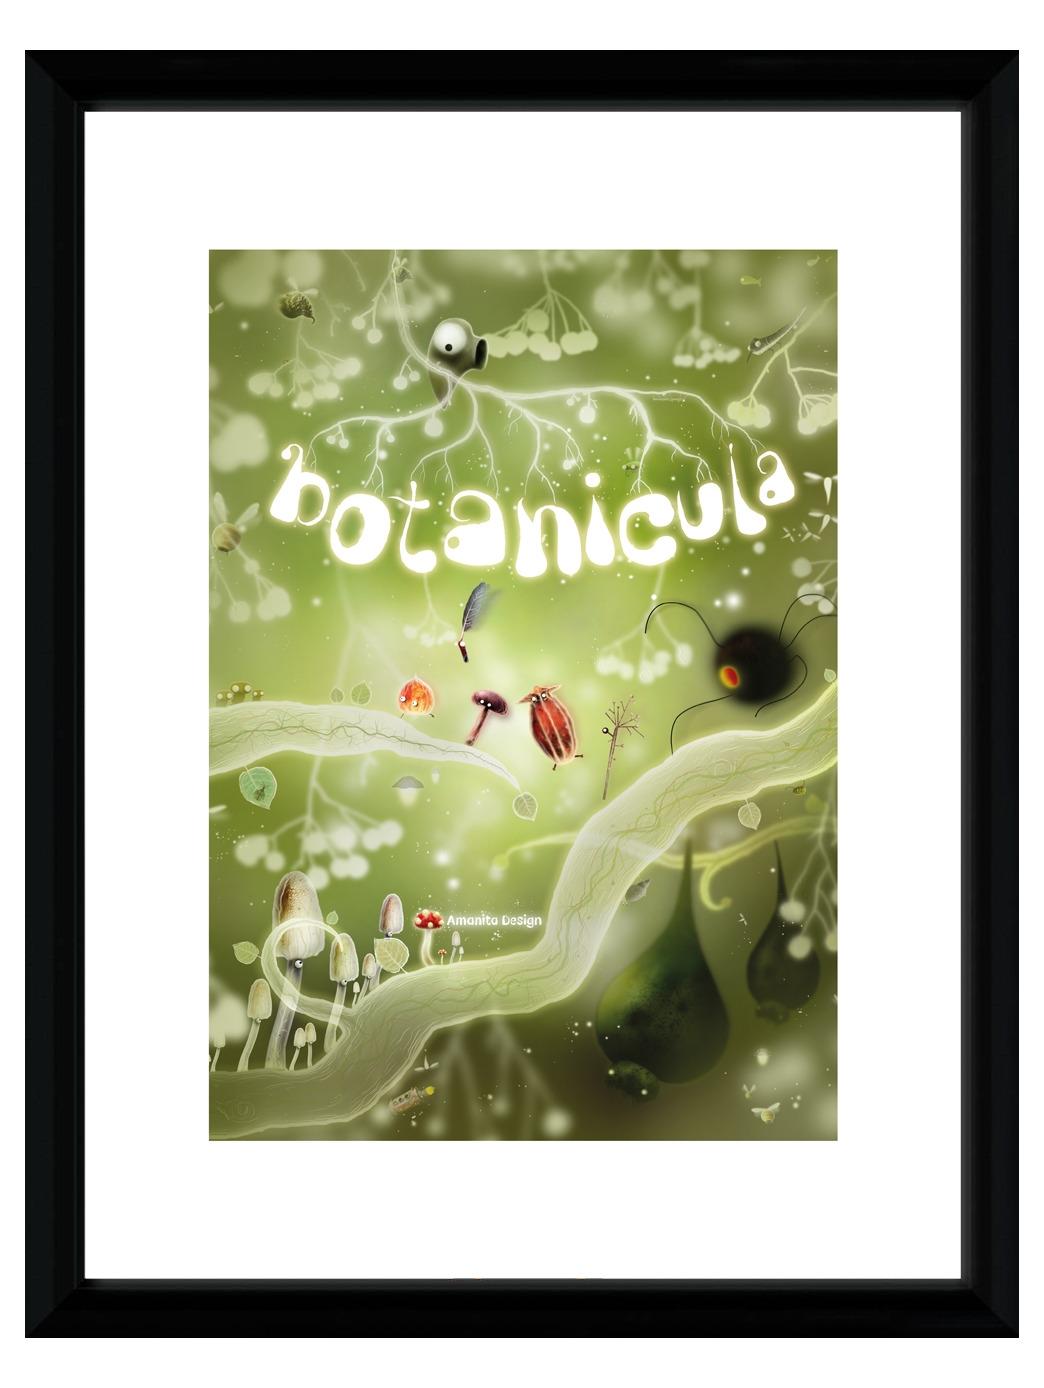 Zarámovaný plakát Xzone Originals - Botanicula (PC)